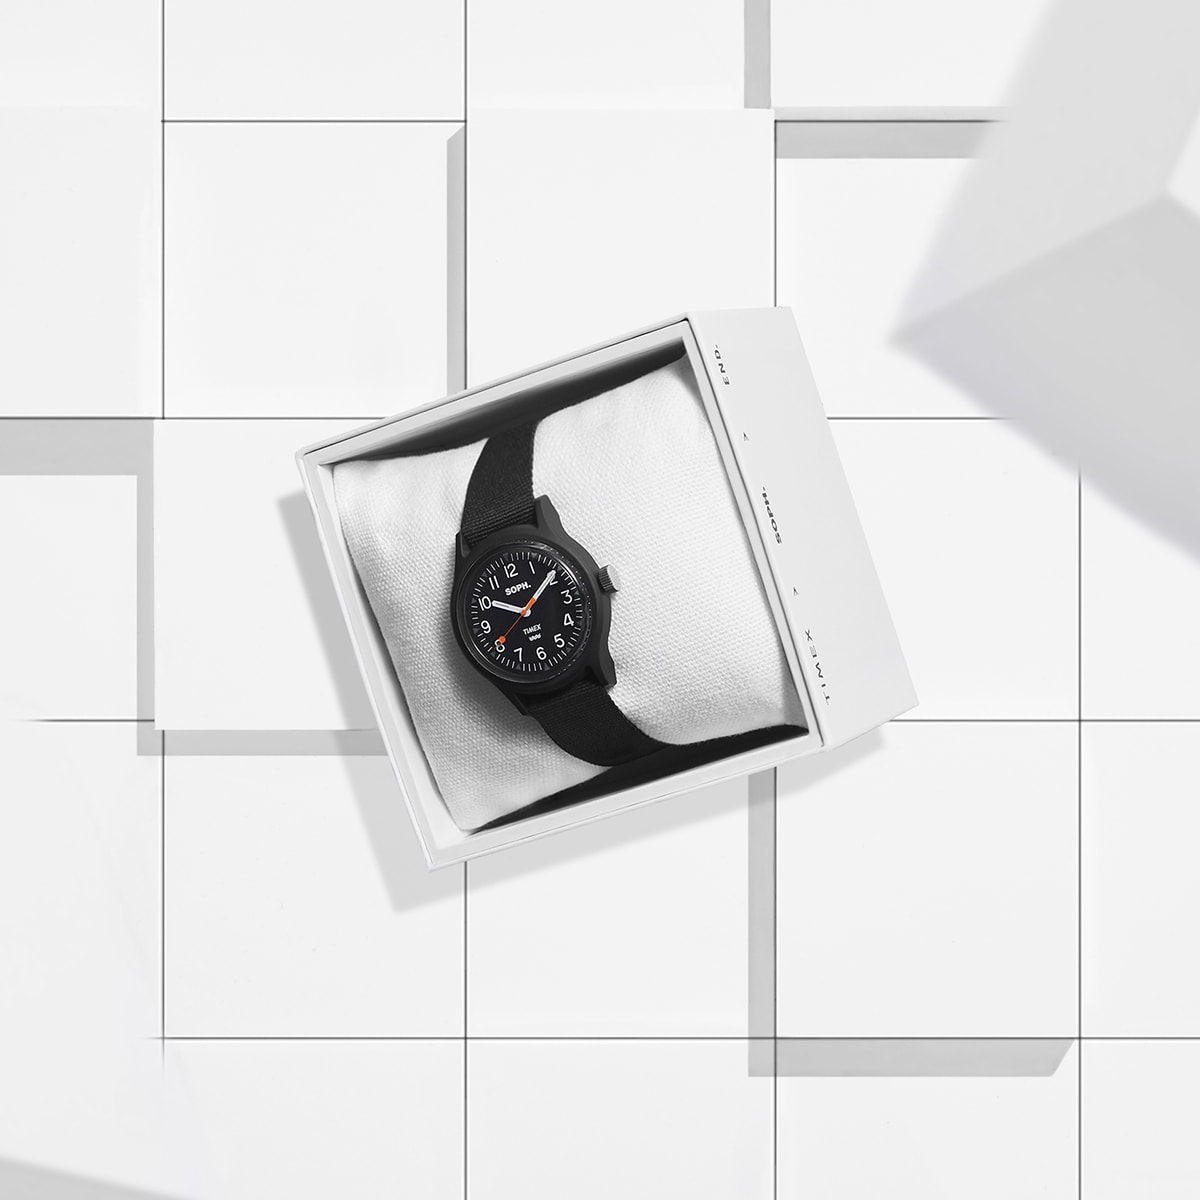 The END. x SOPH. x Timex MK1 watch in black.